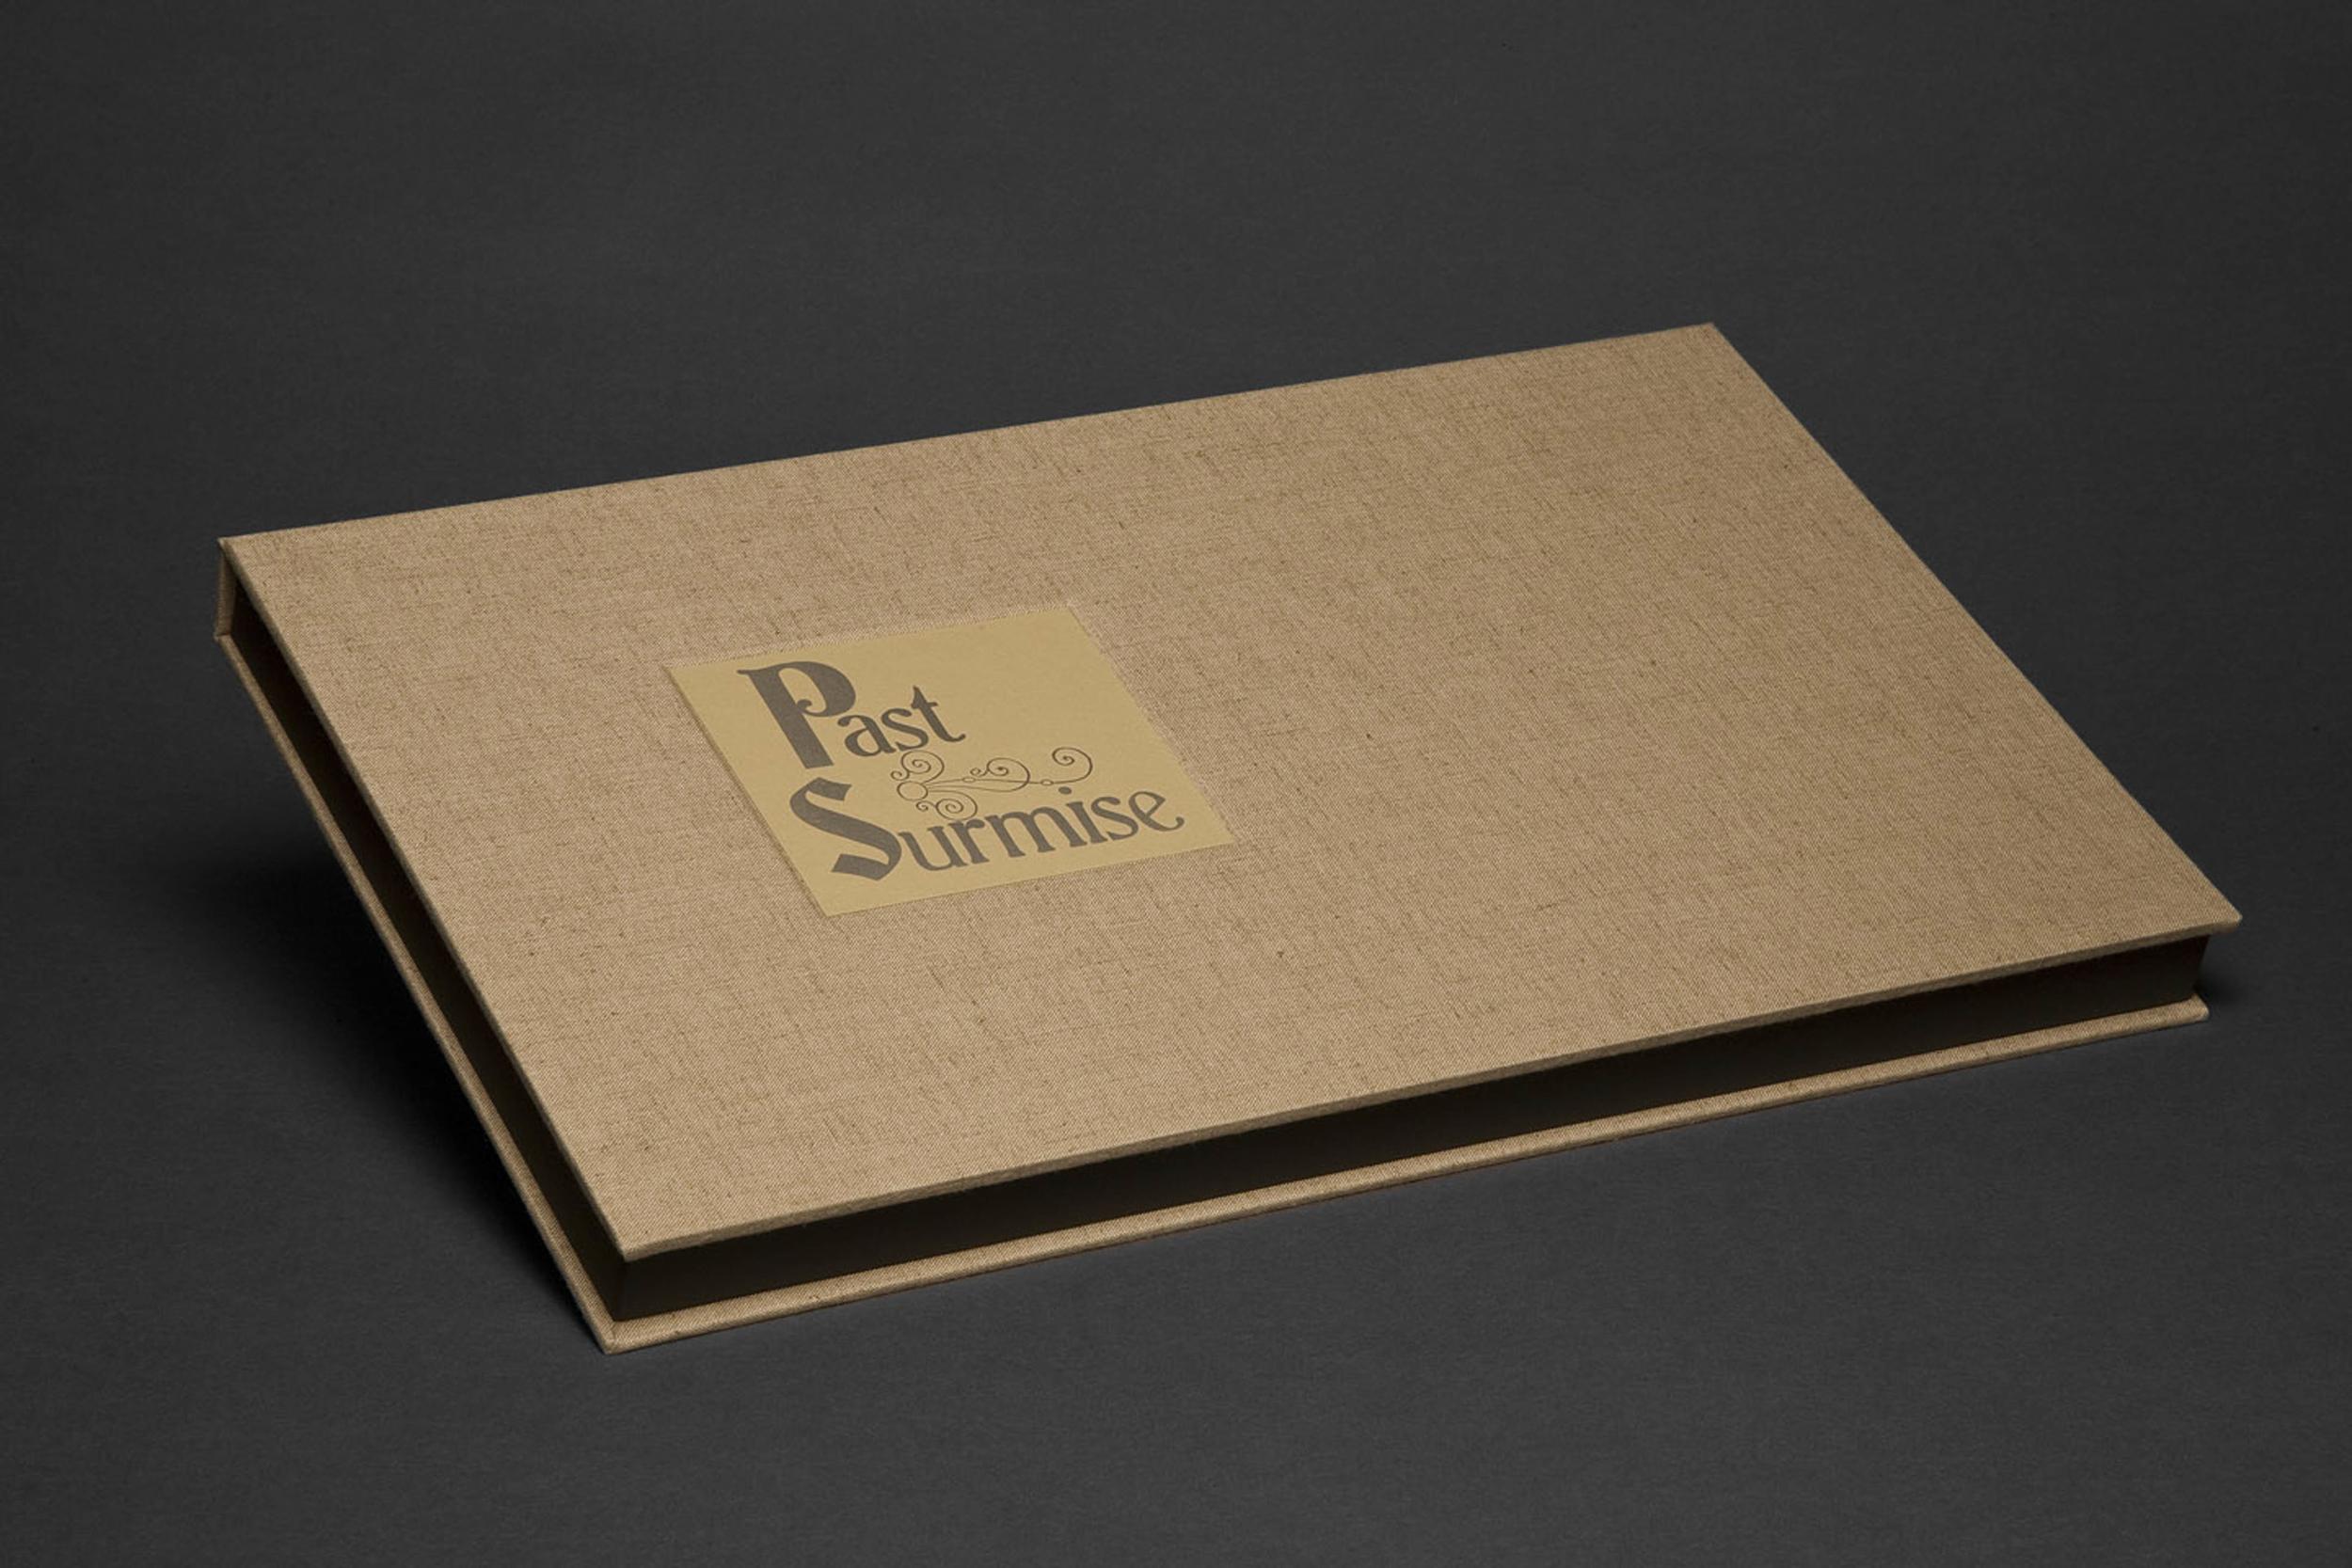 Past Surmise, box closed.jpg